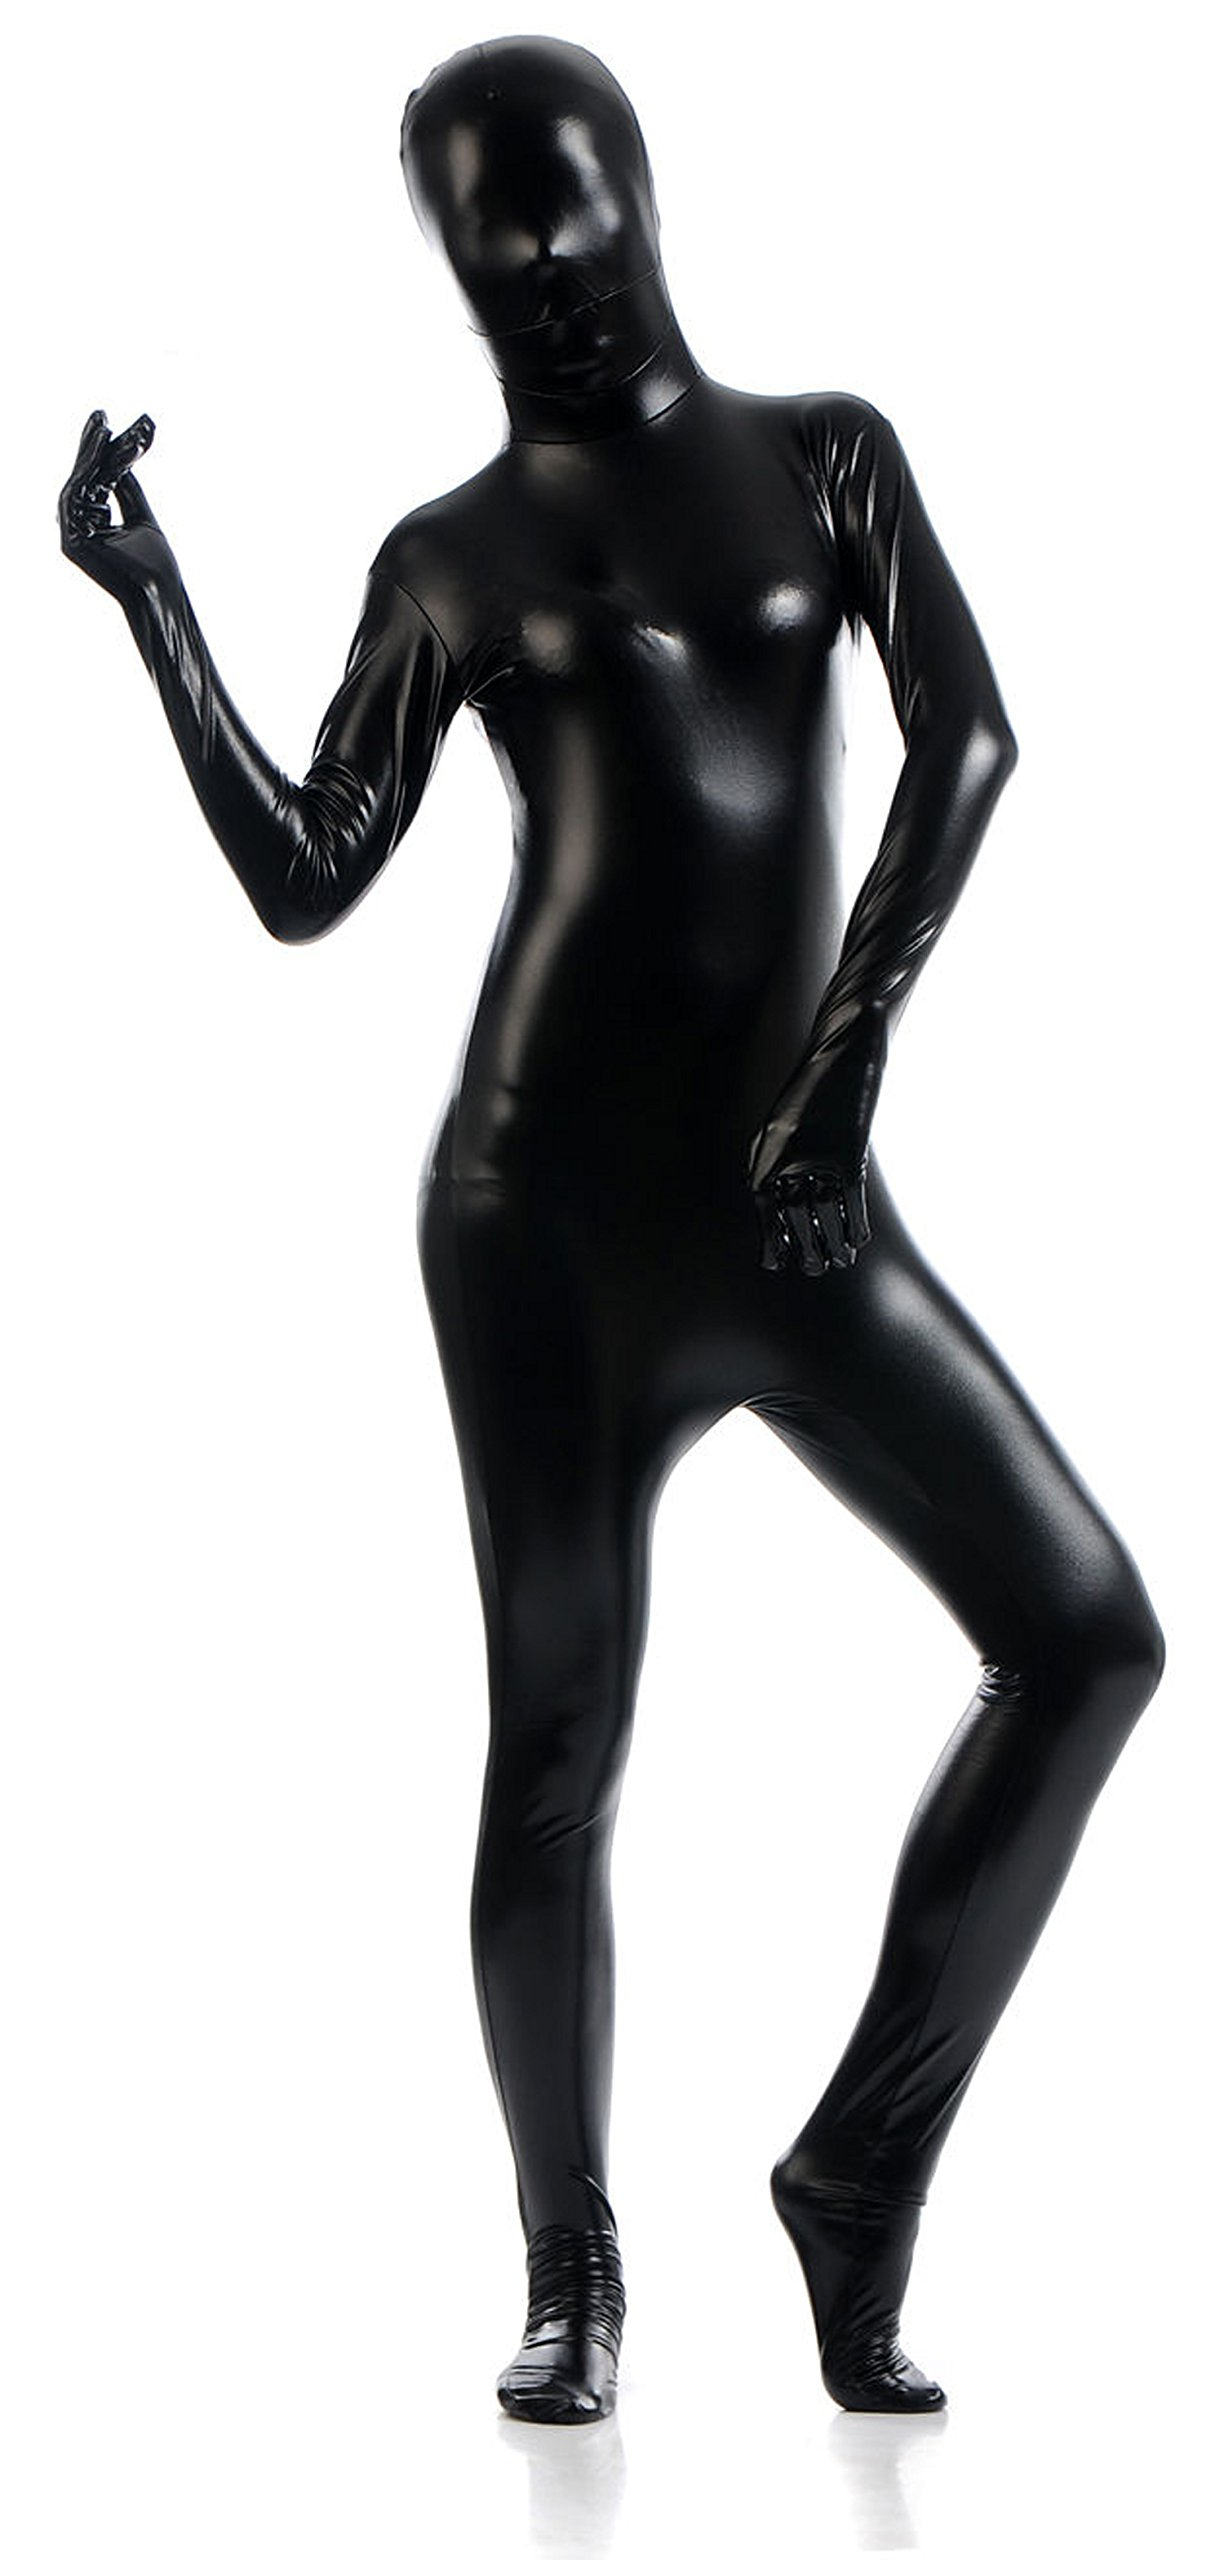 VSVO Unisex Skin-tight Spandex Full Bodysuit for Adults and Children 71JDWI6 N2L